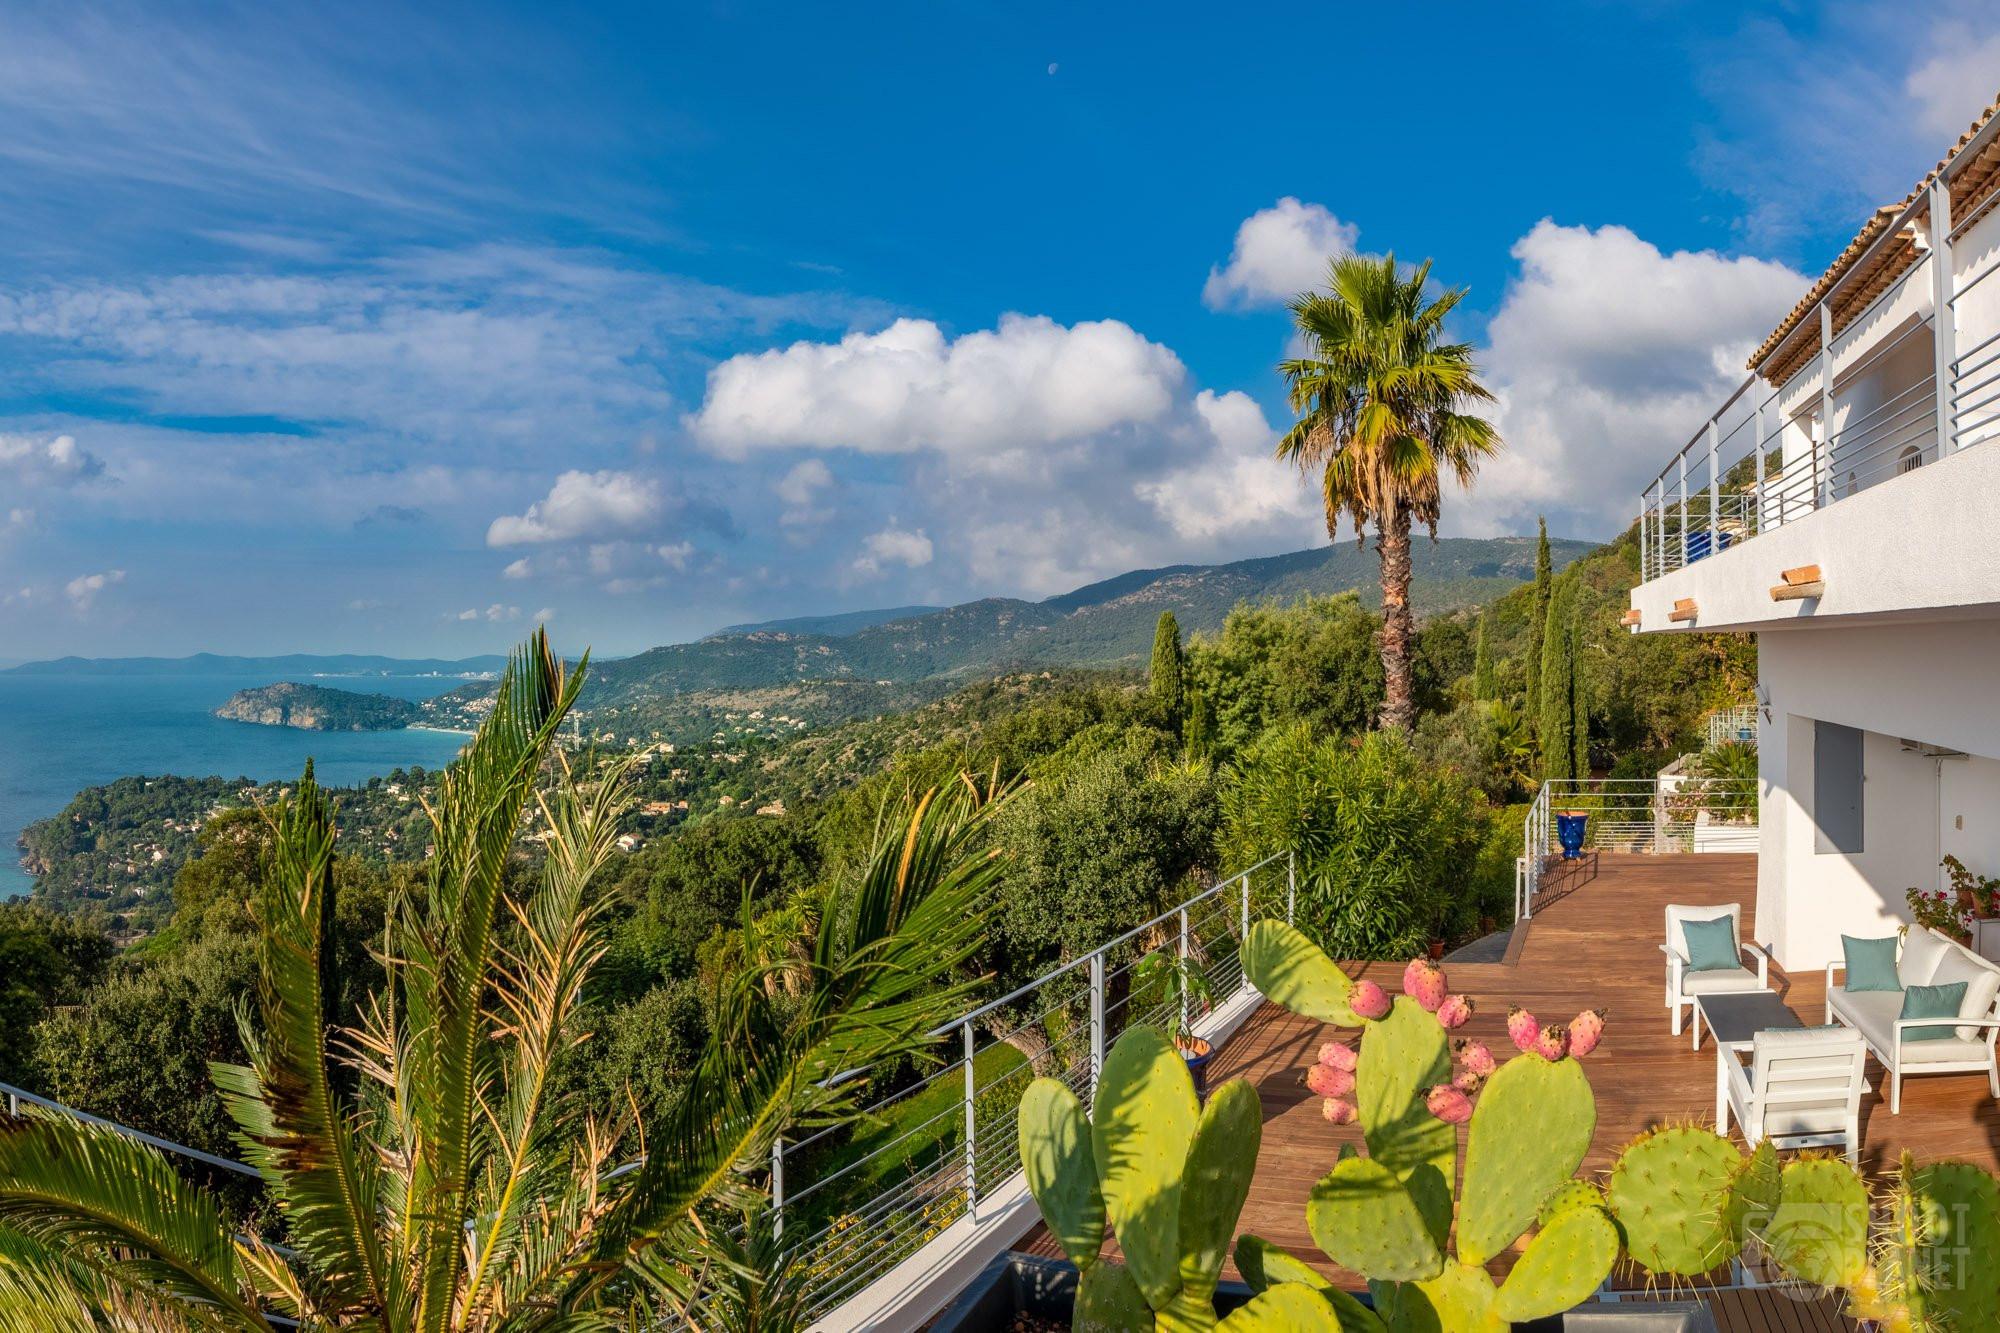 Terrasse view from Vistazur house, Azure Coast France